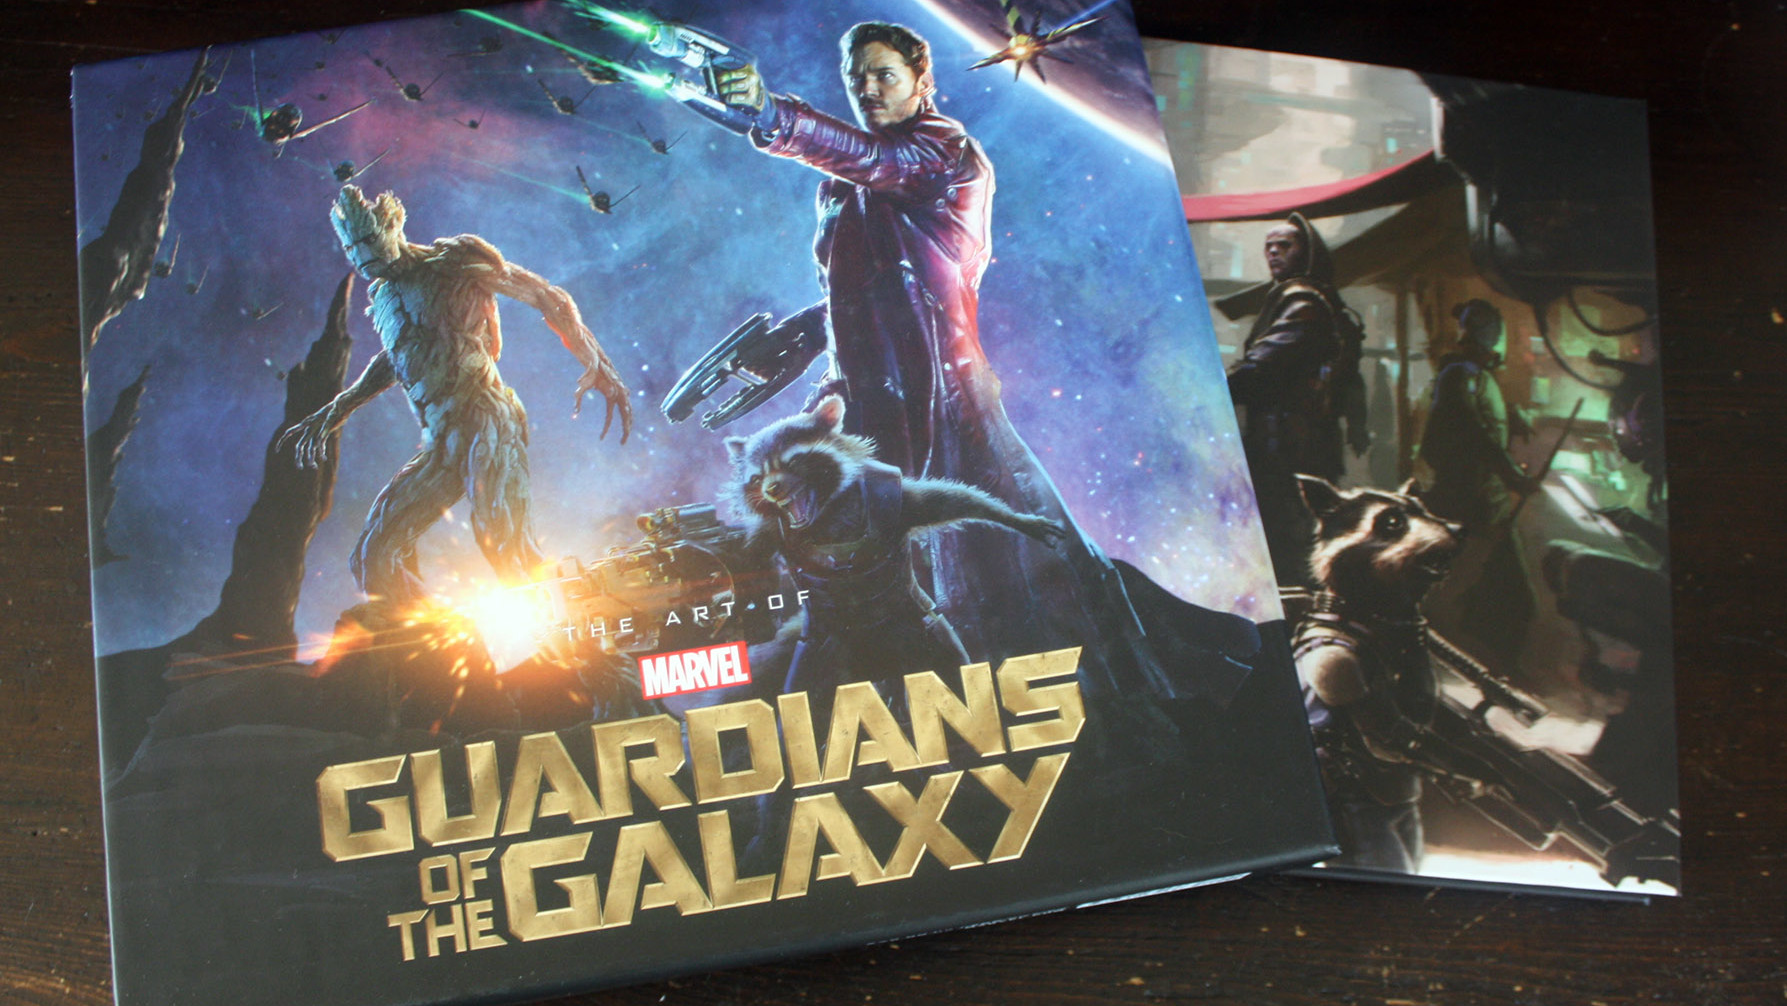 Fraai boek - The Art of Marvel's Guardians of the Galaxy